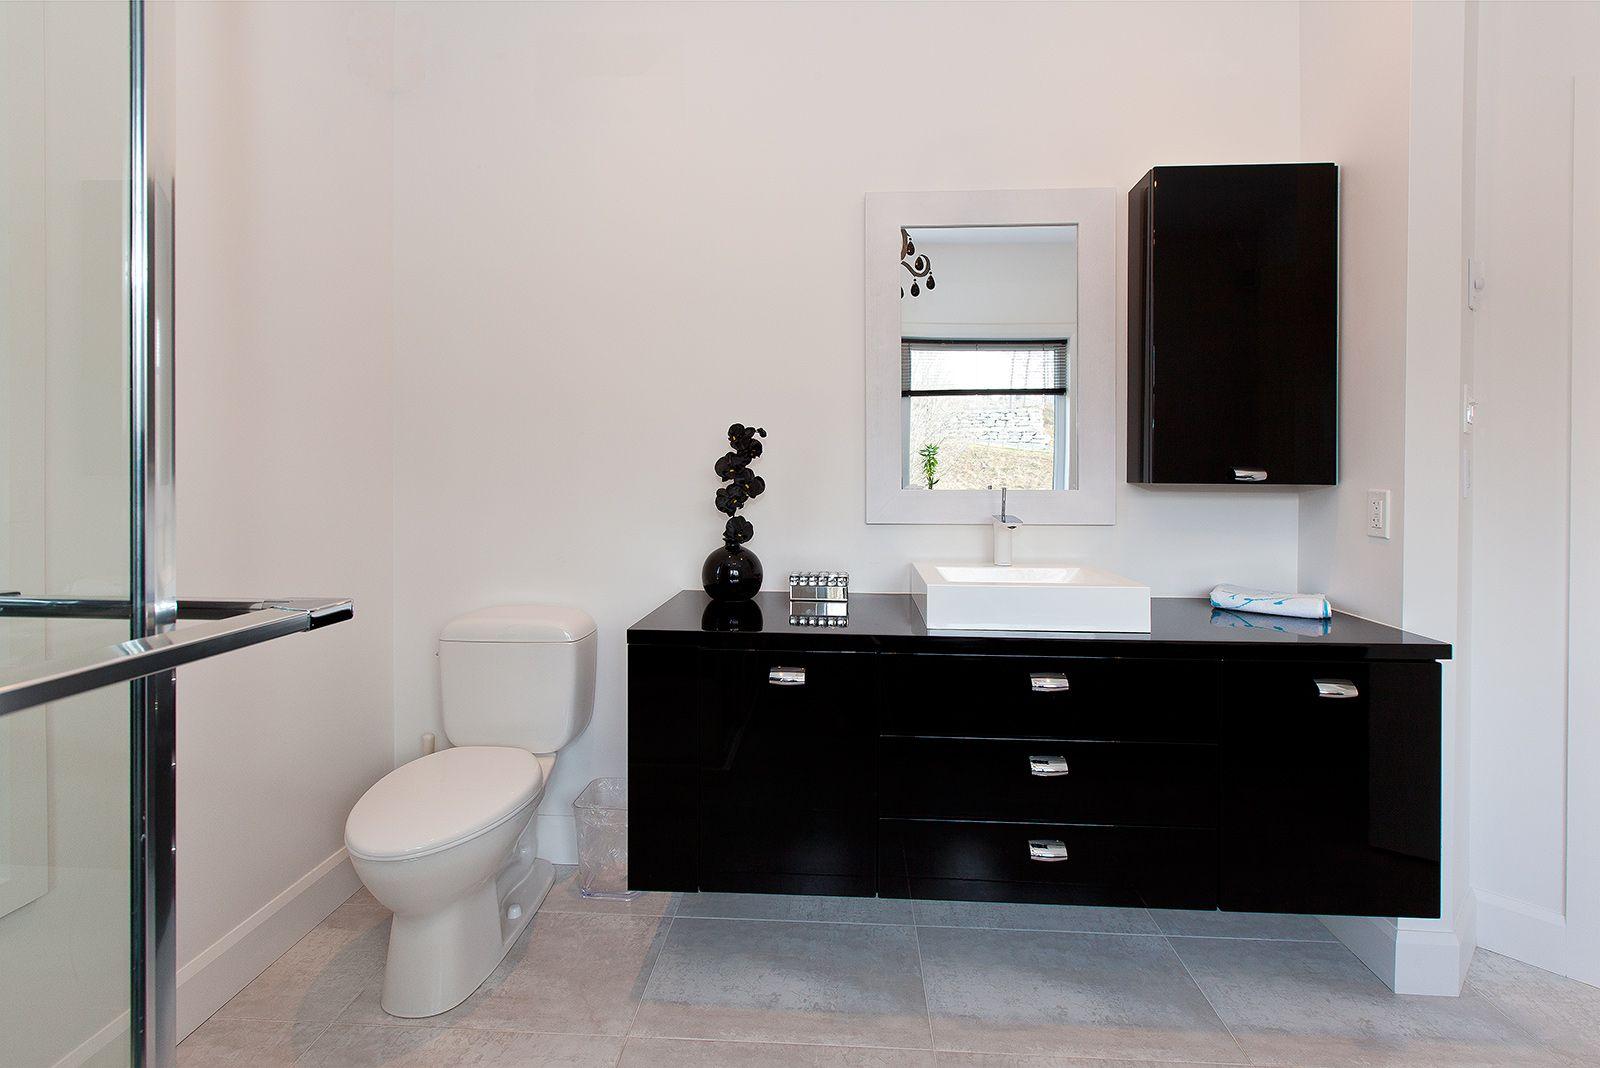 Salle de bains moderne griffe cuisine for Salle de bain moderne oran